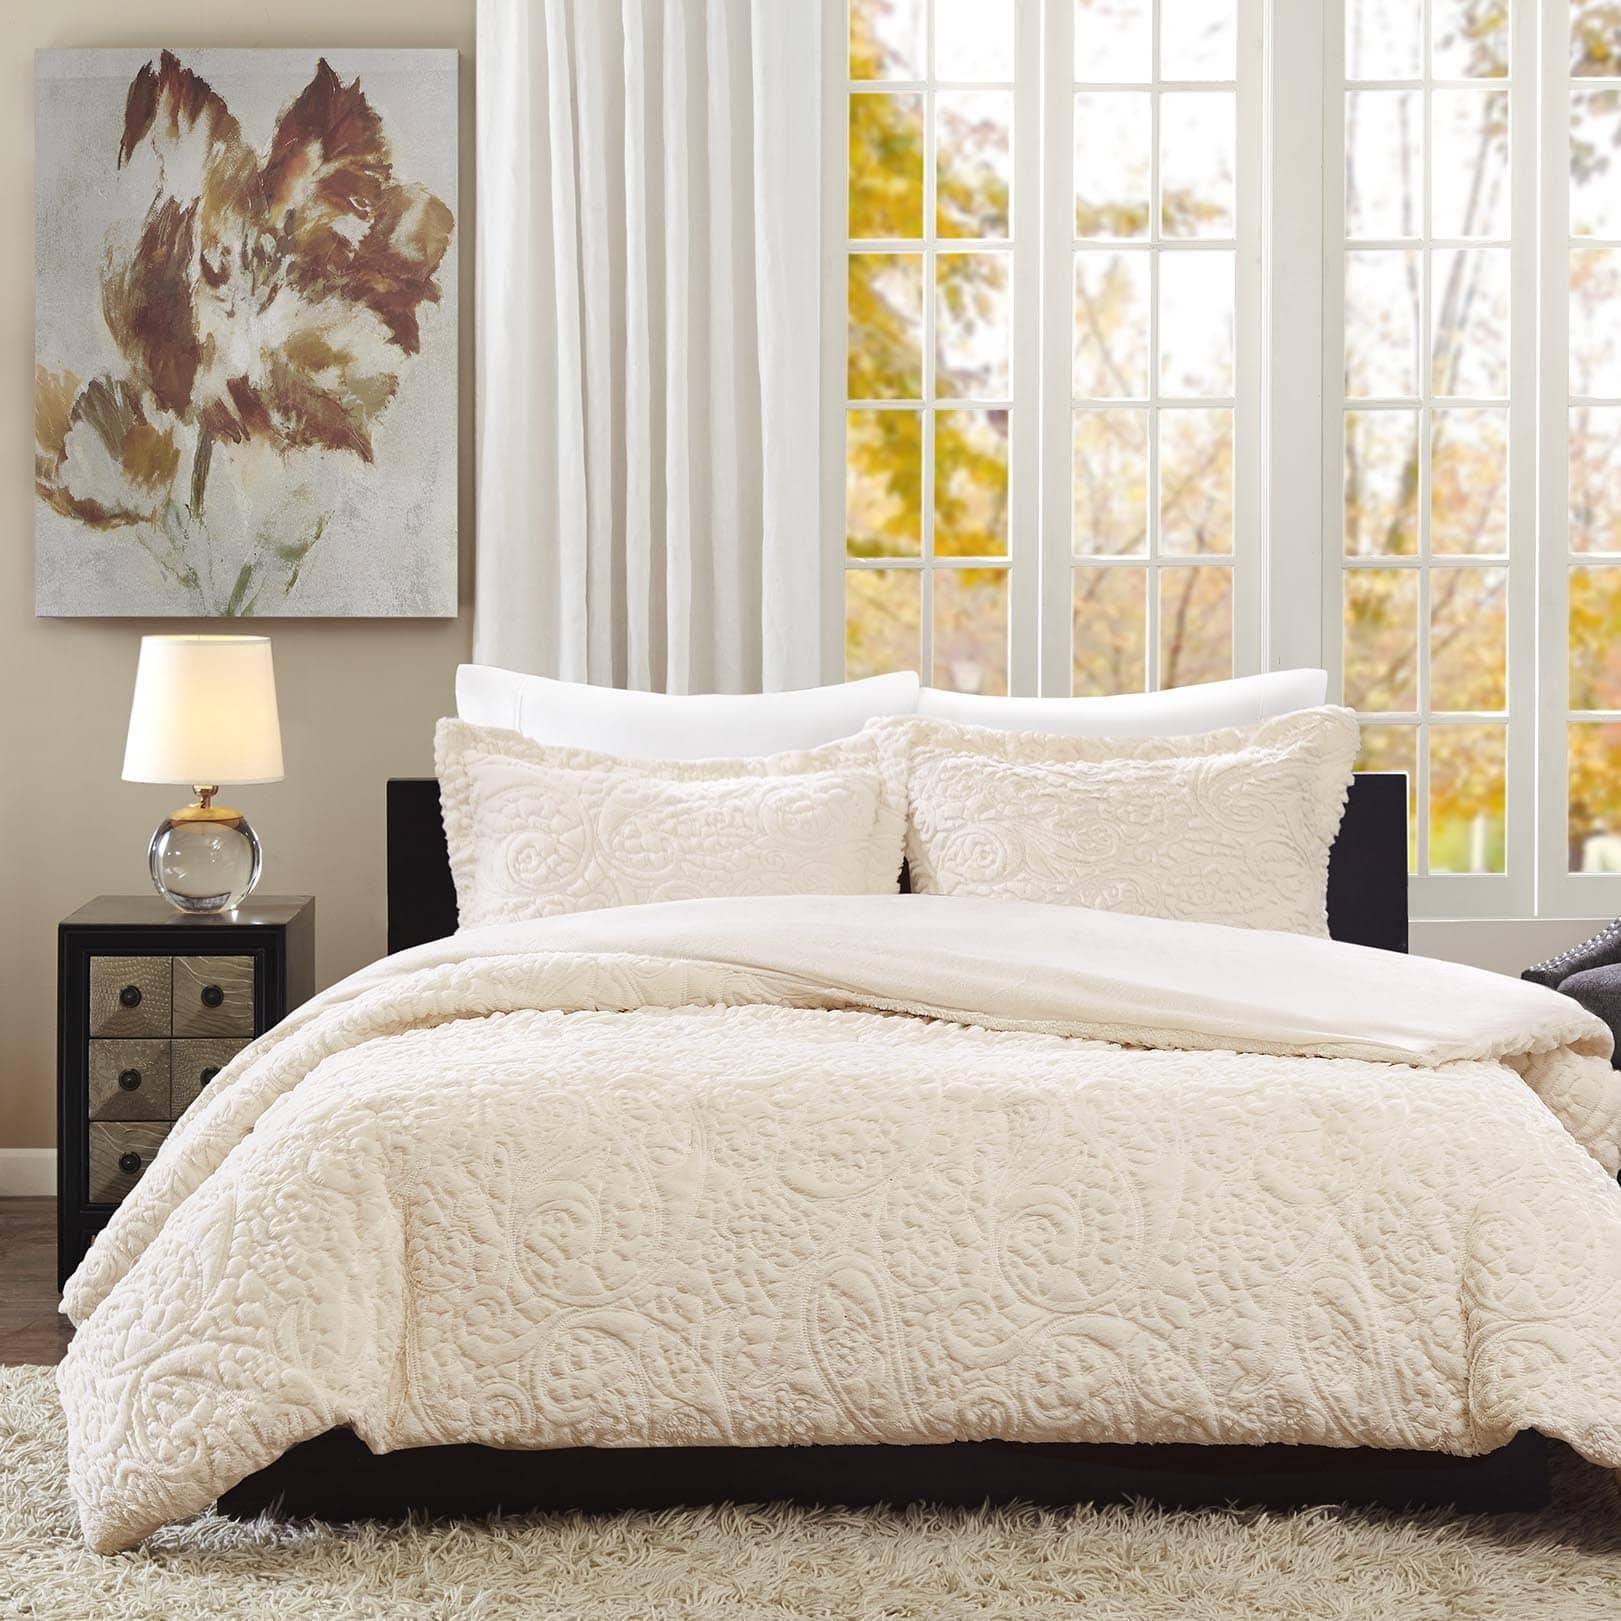 Comforter Sets Comforter Sets Ivory Comforter Comforters Ivory queen comforter set